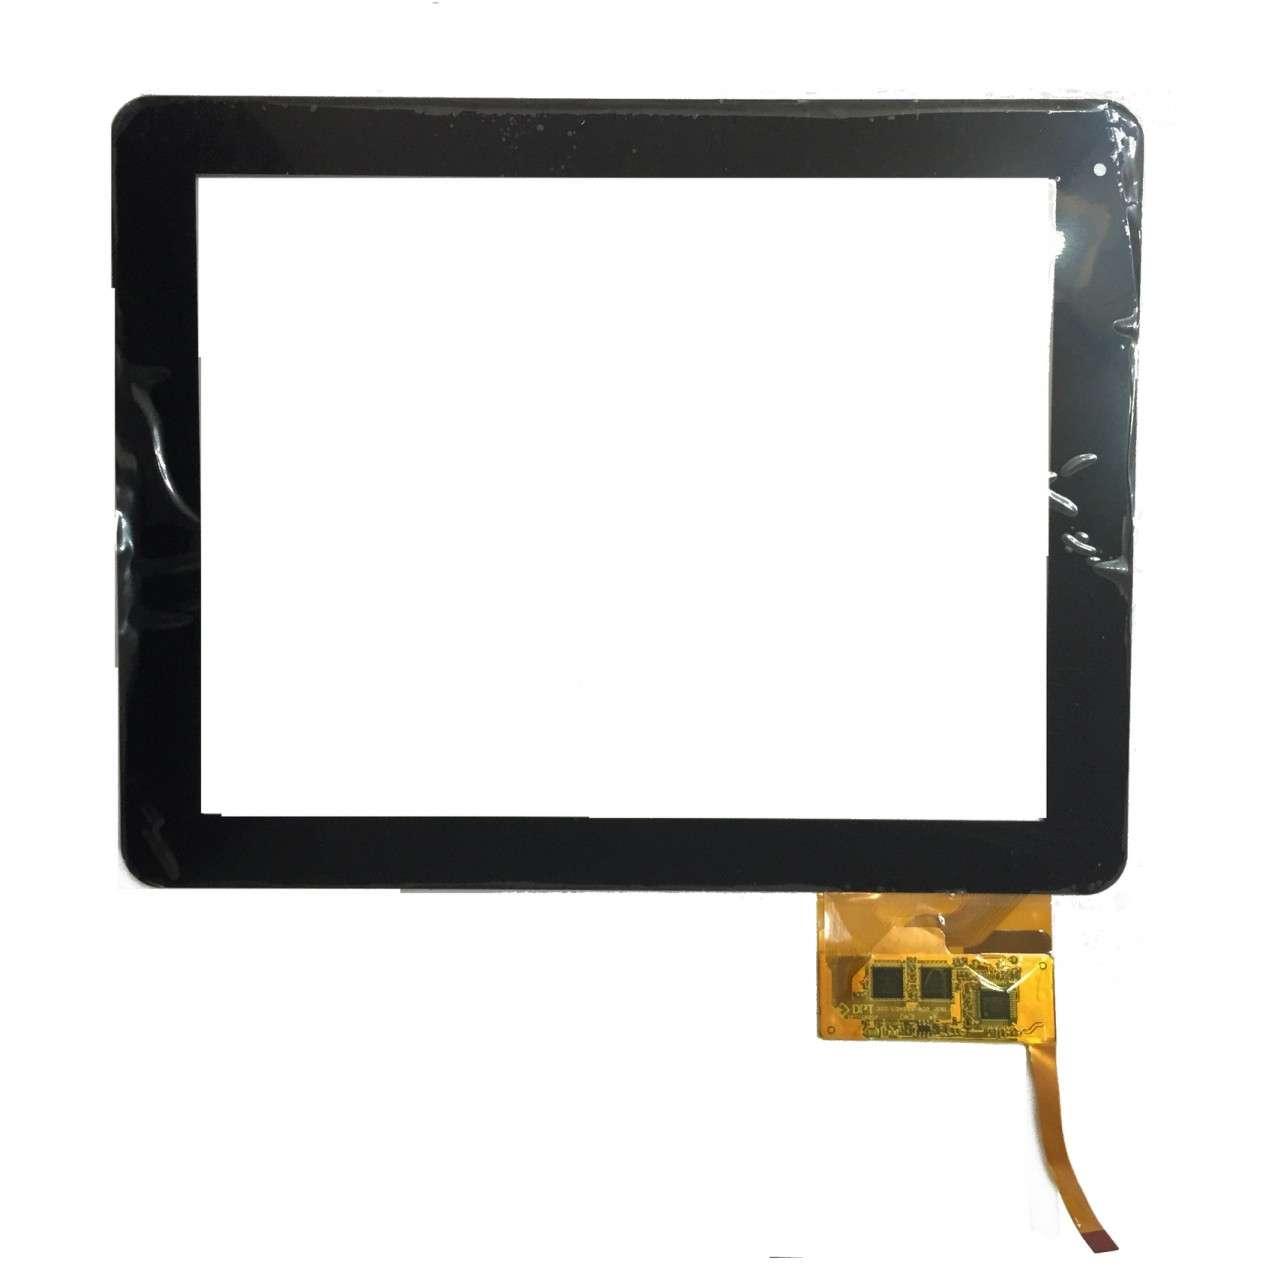 Touchscreen Digitizer Szenio Tablet IPS 9700DN Geam Sticla Tableta imagine powerlaptop.ro 2021